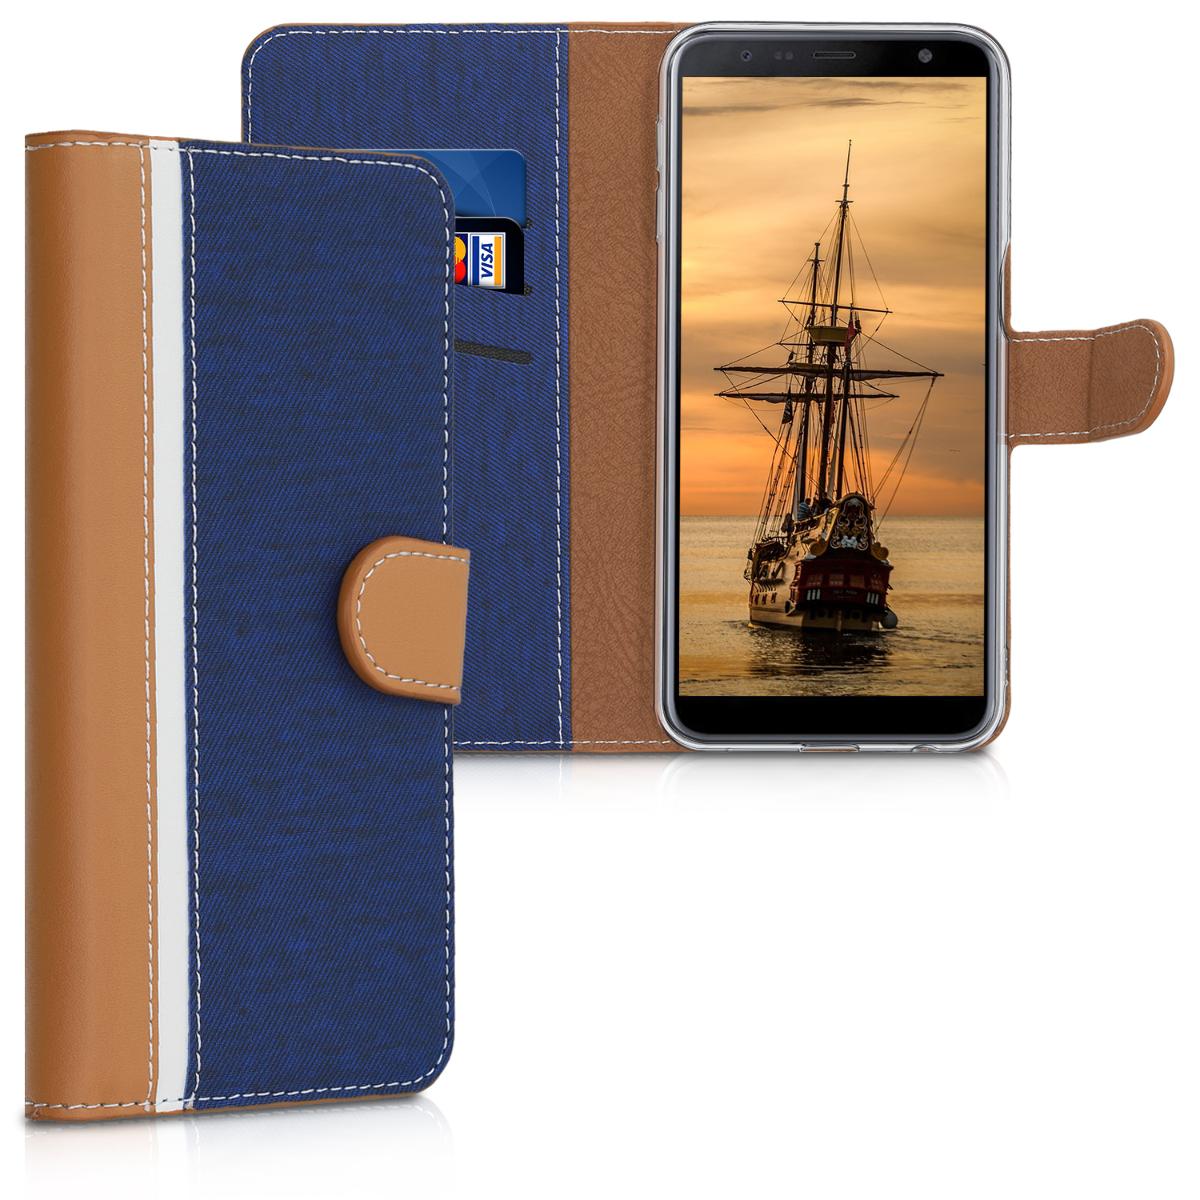 Kožené pouzdro pro Samsung J6+ | J6 Plus DUOS - tmavě modré / Brown / bílé